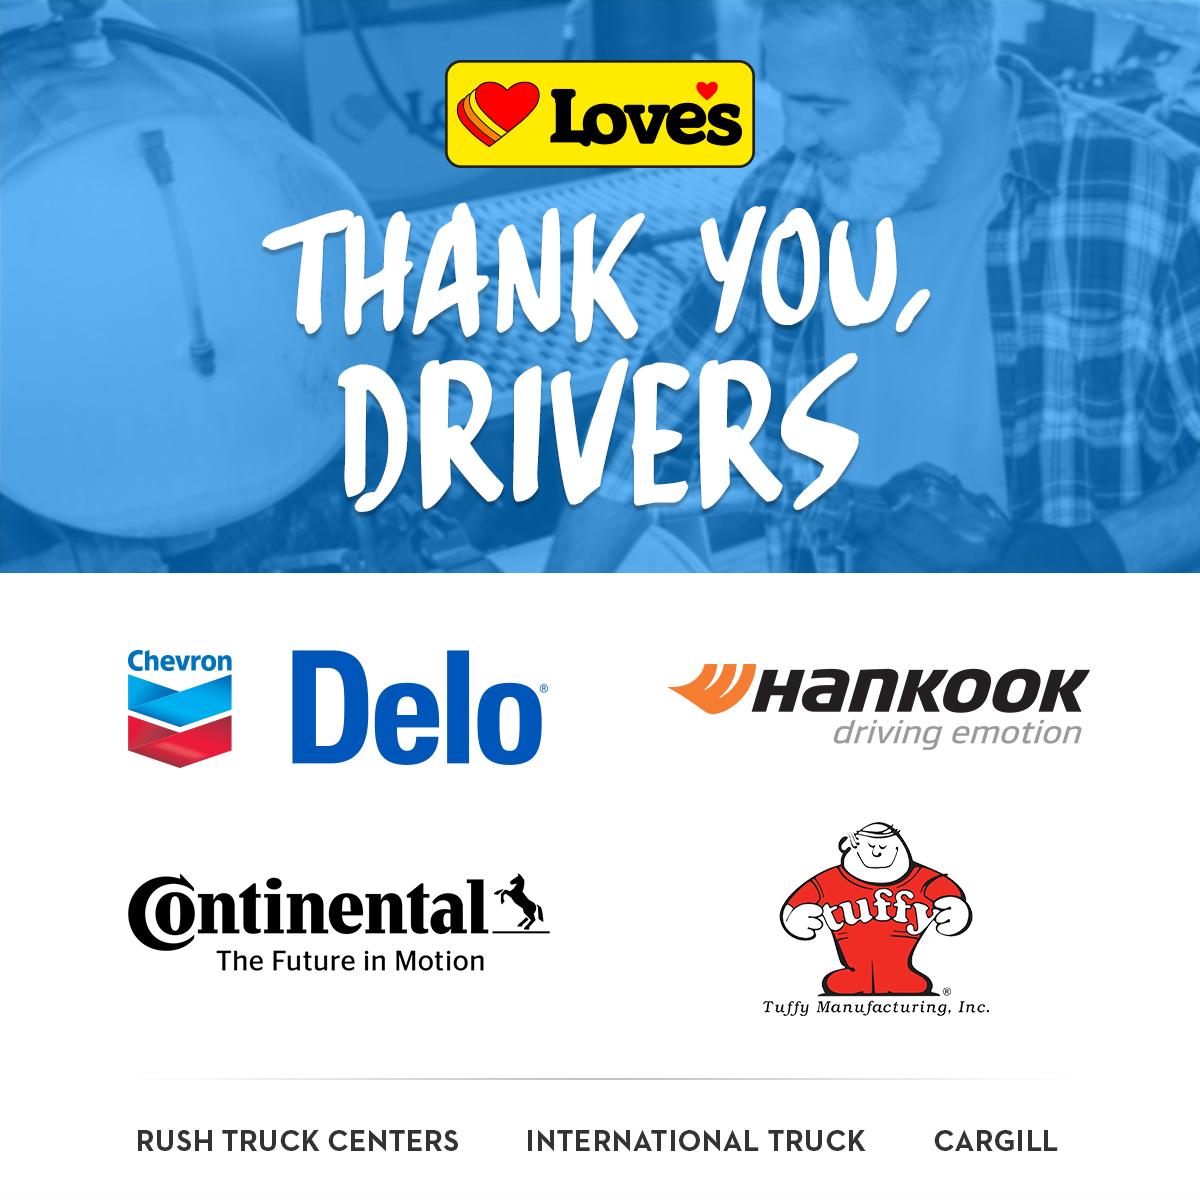 Thank you drivers logos 1